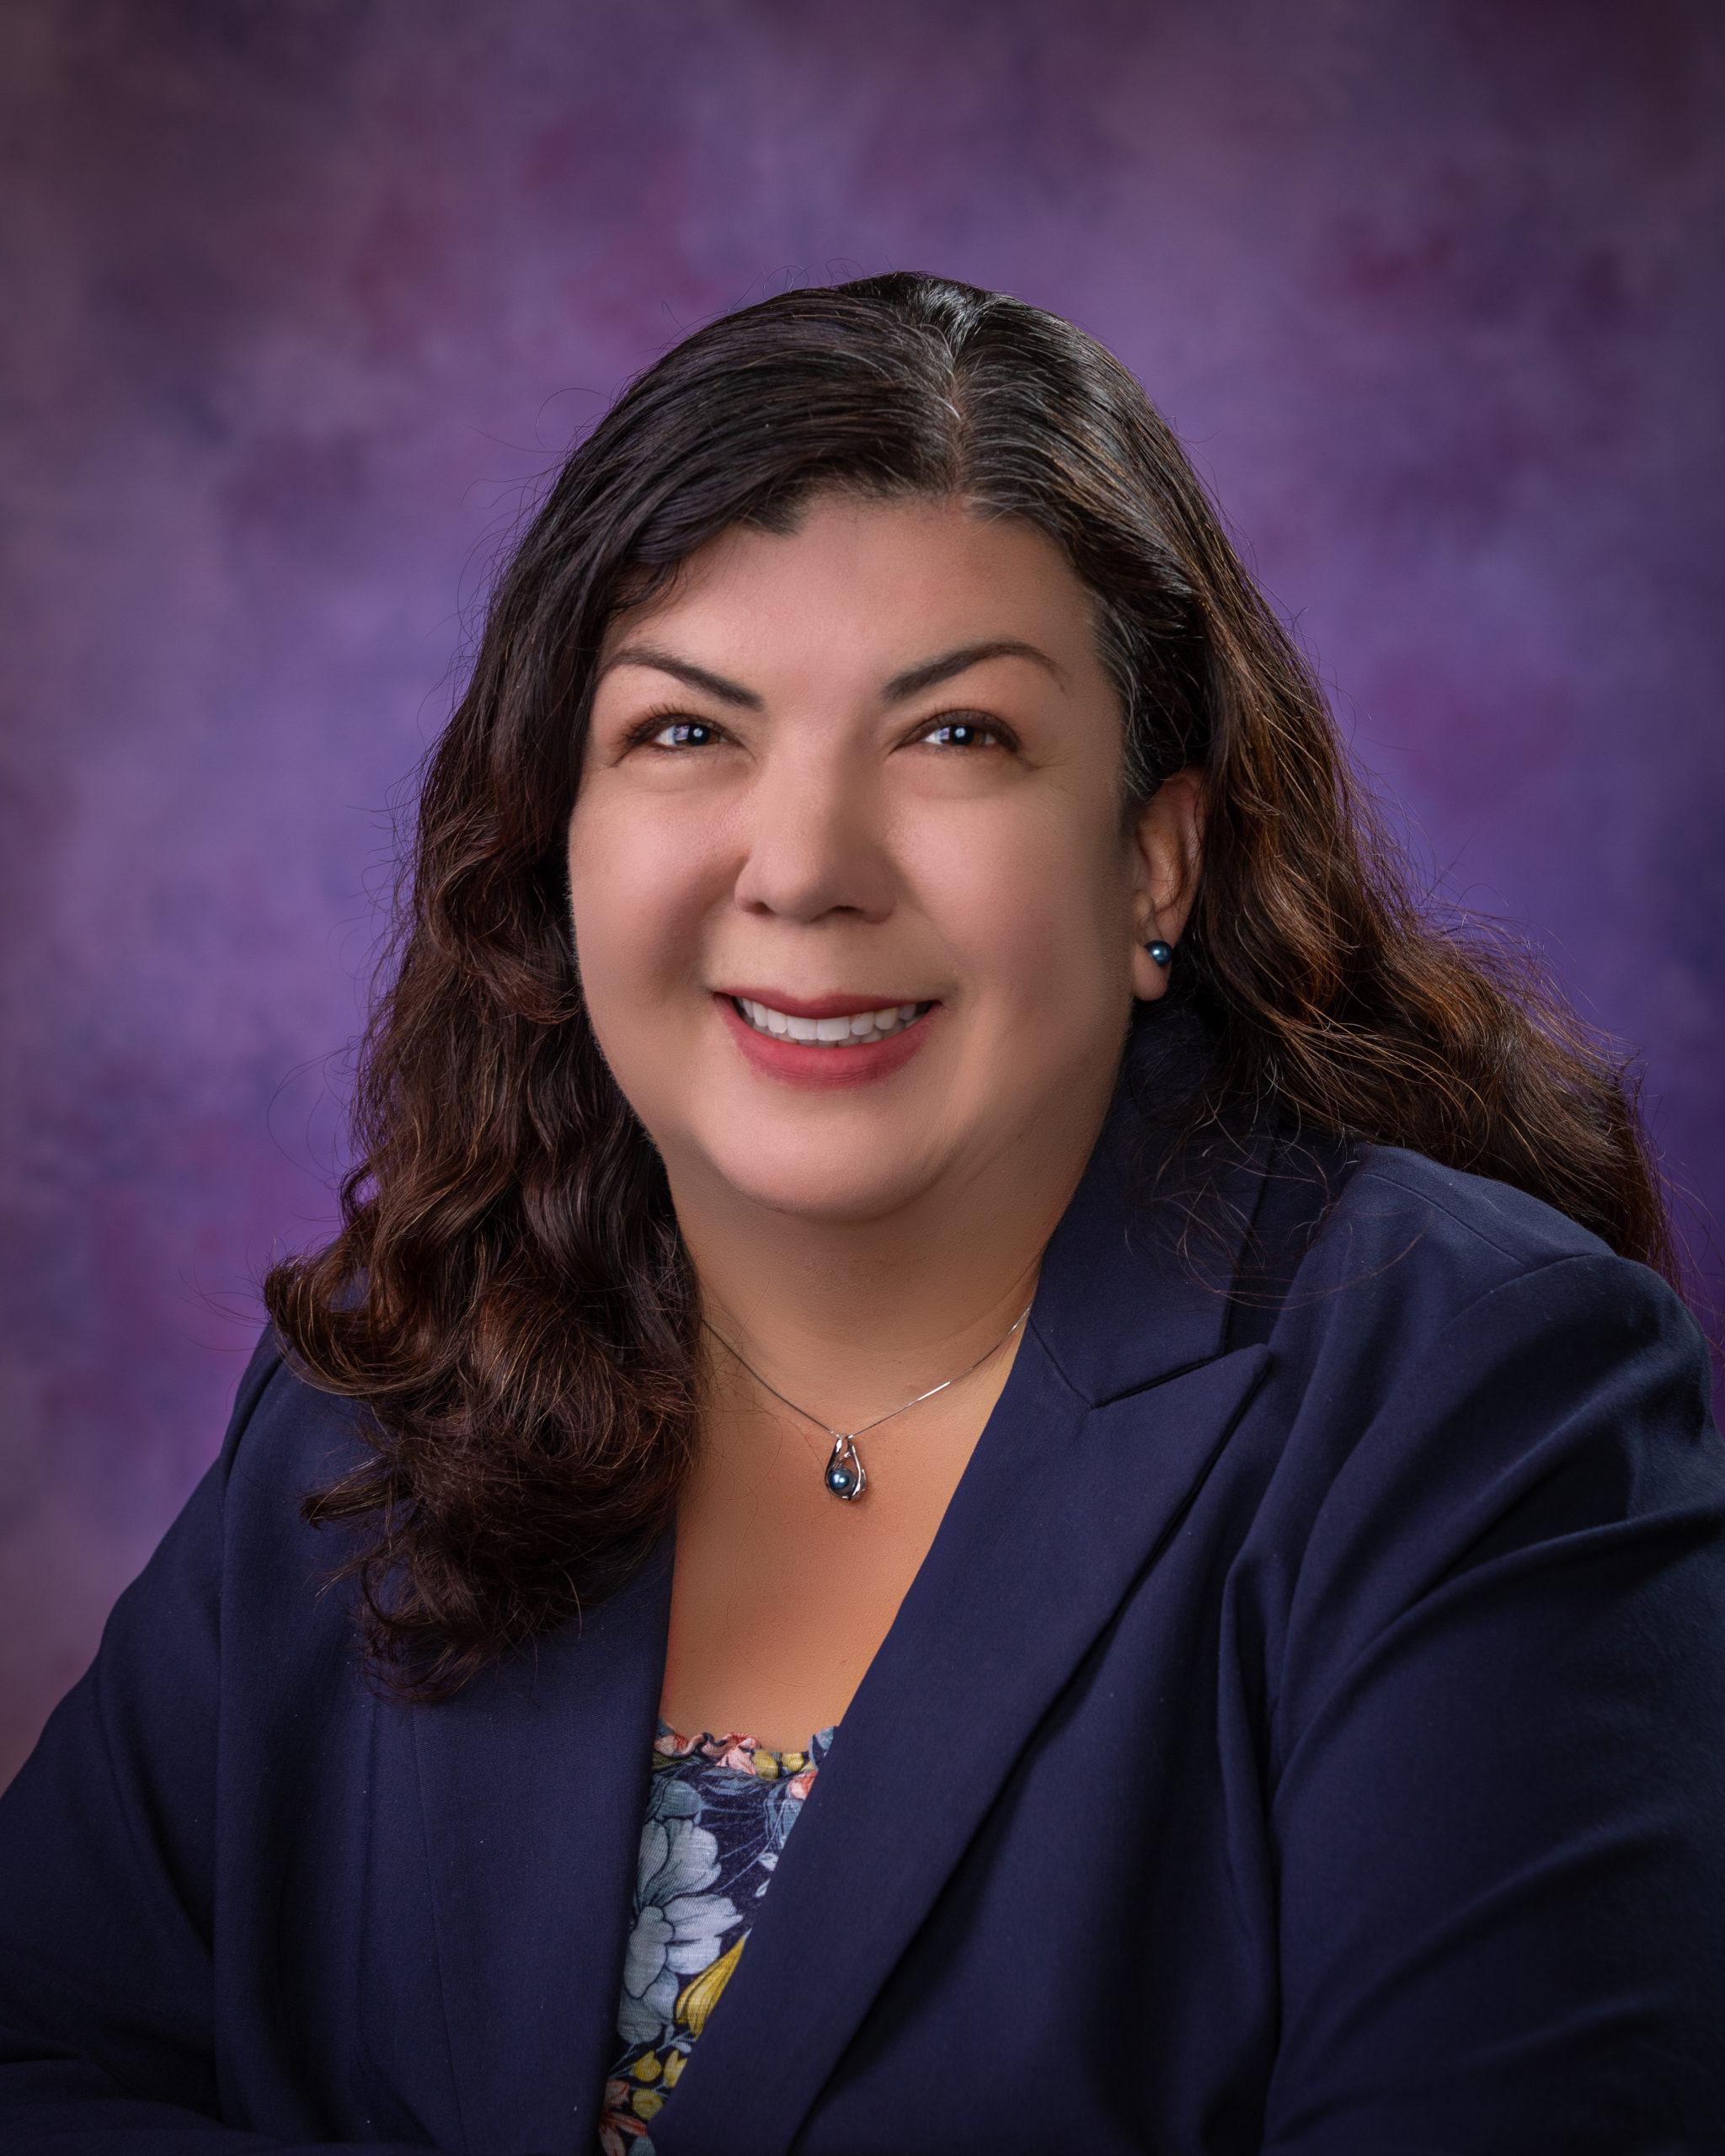 Christina Villaseñor